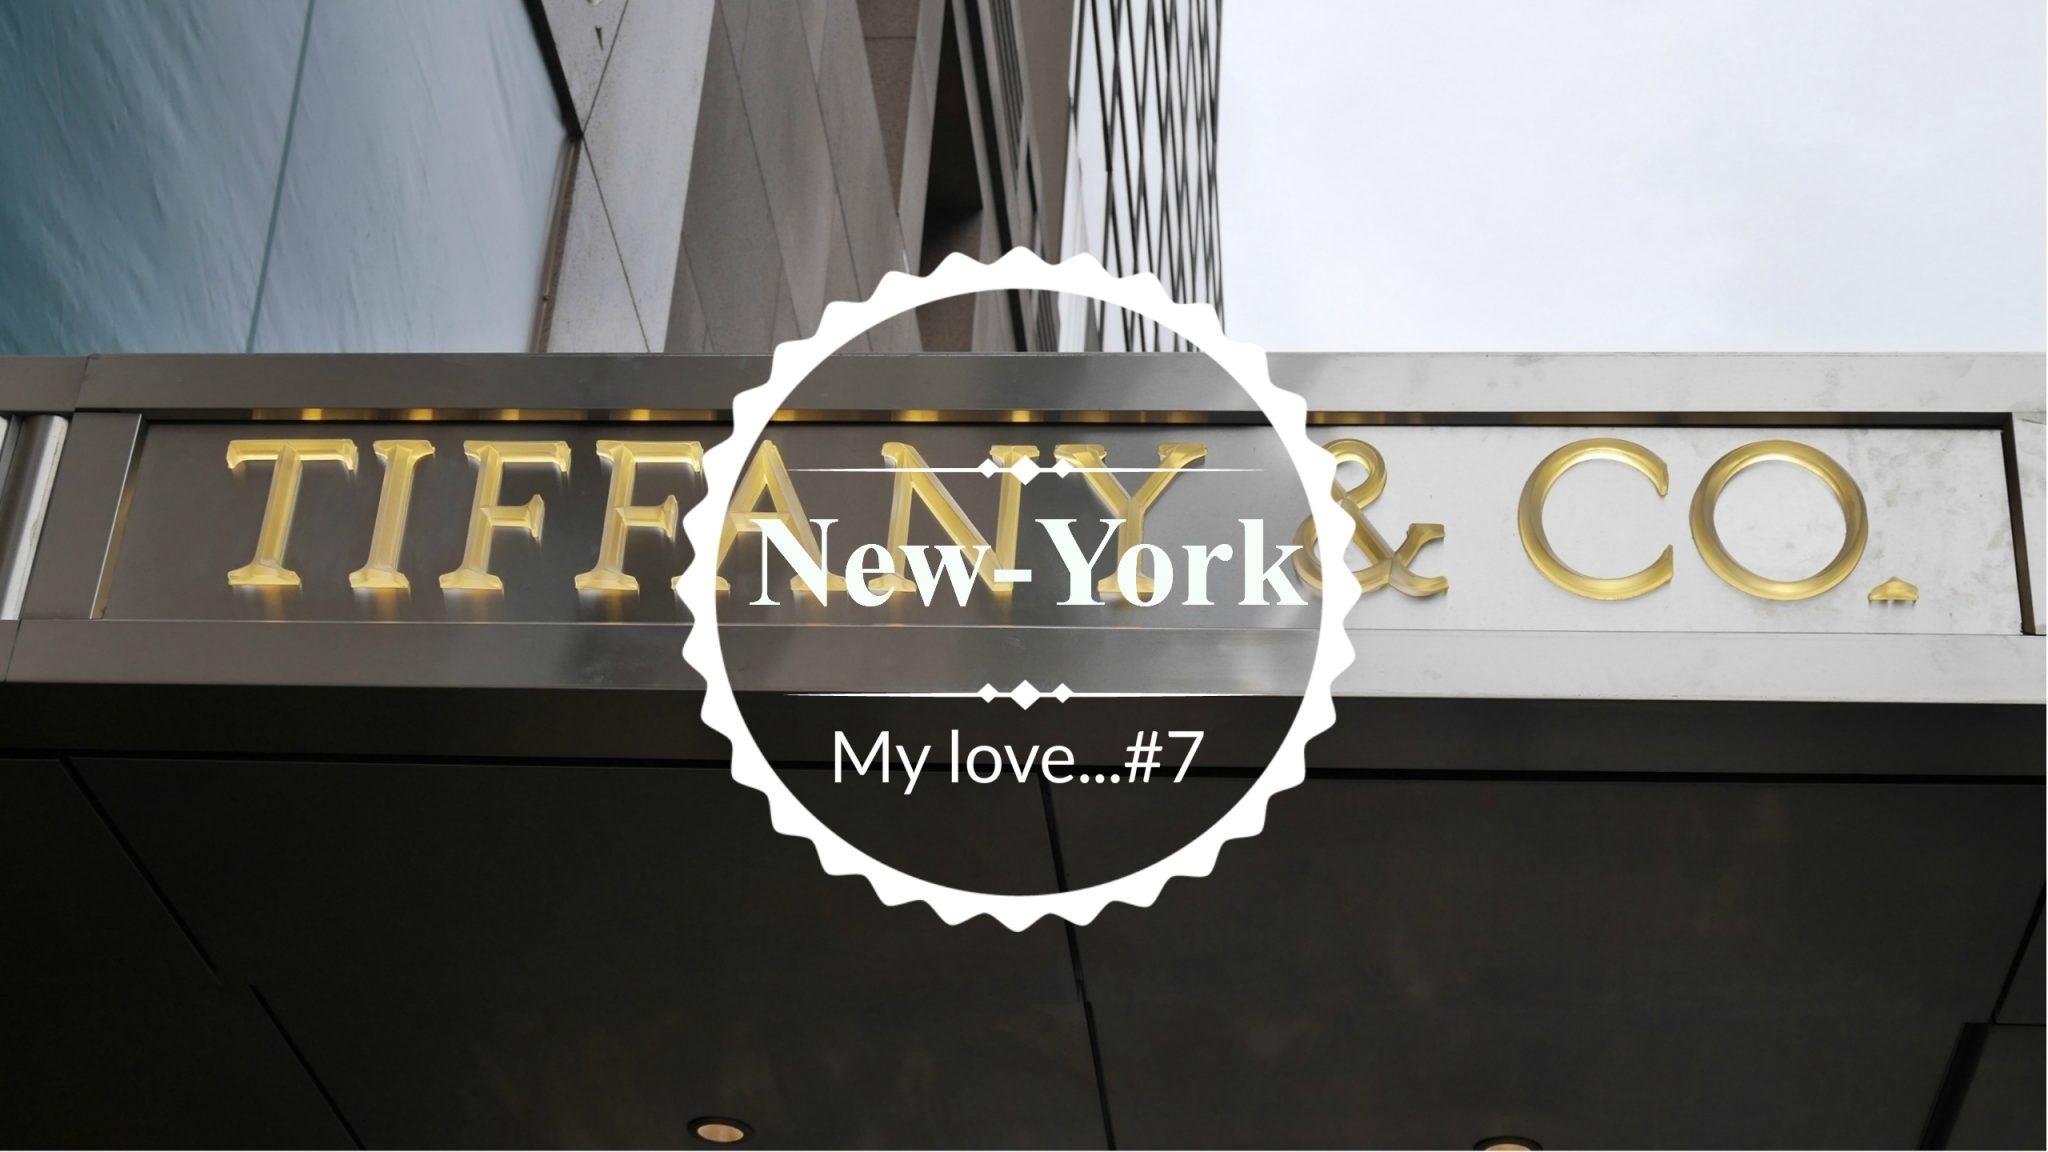 New-York-my-love-7